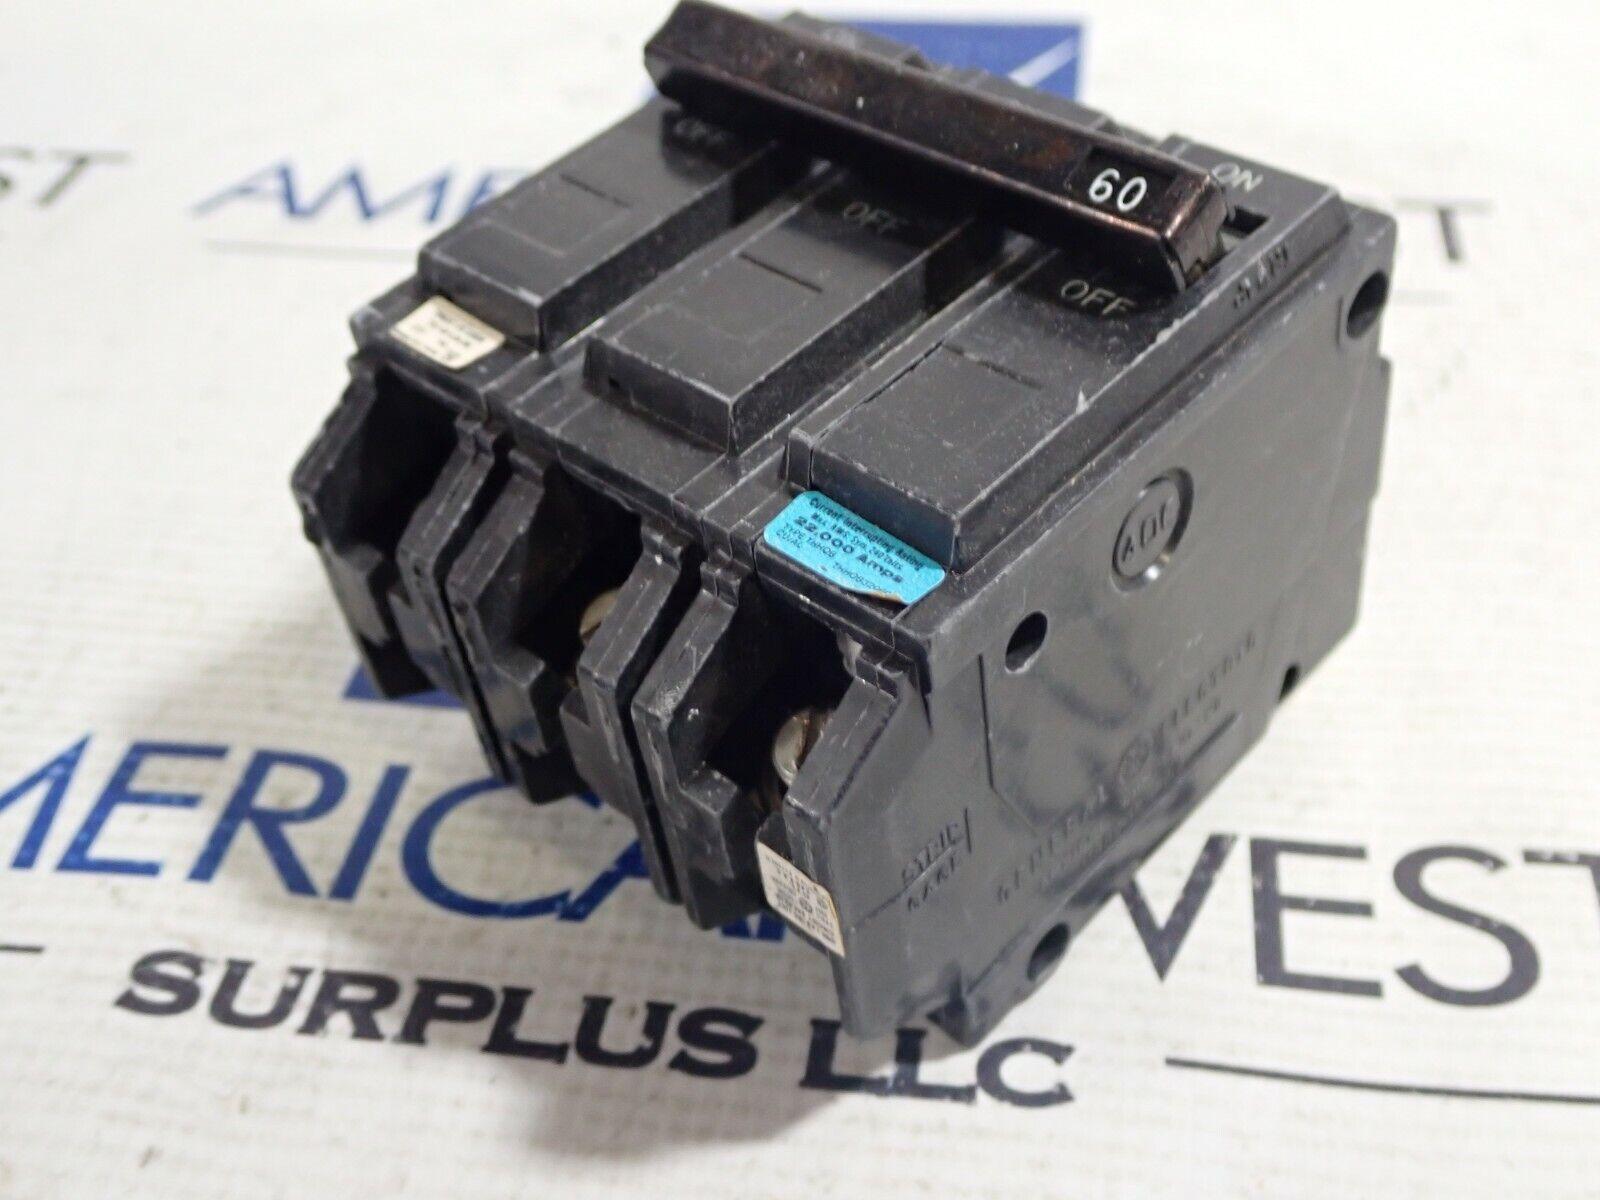 22kA General Electric Circuit Breaker 240V THQ - THHQB32060 60A 3Pole GE